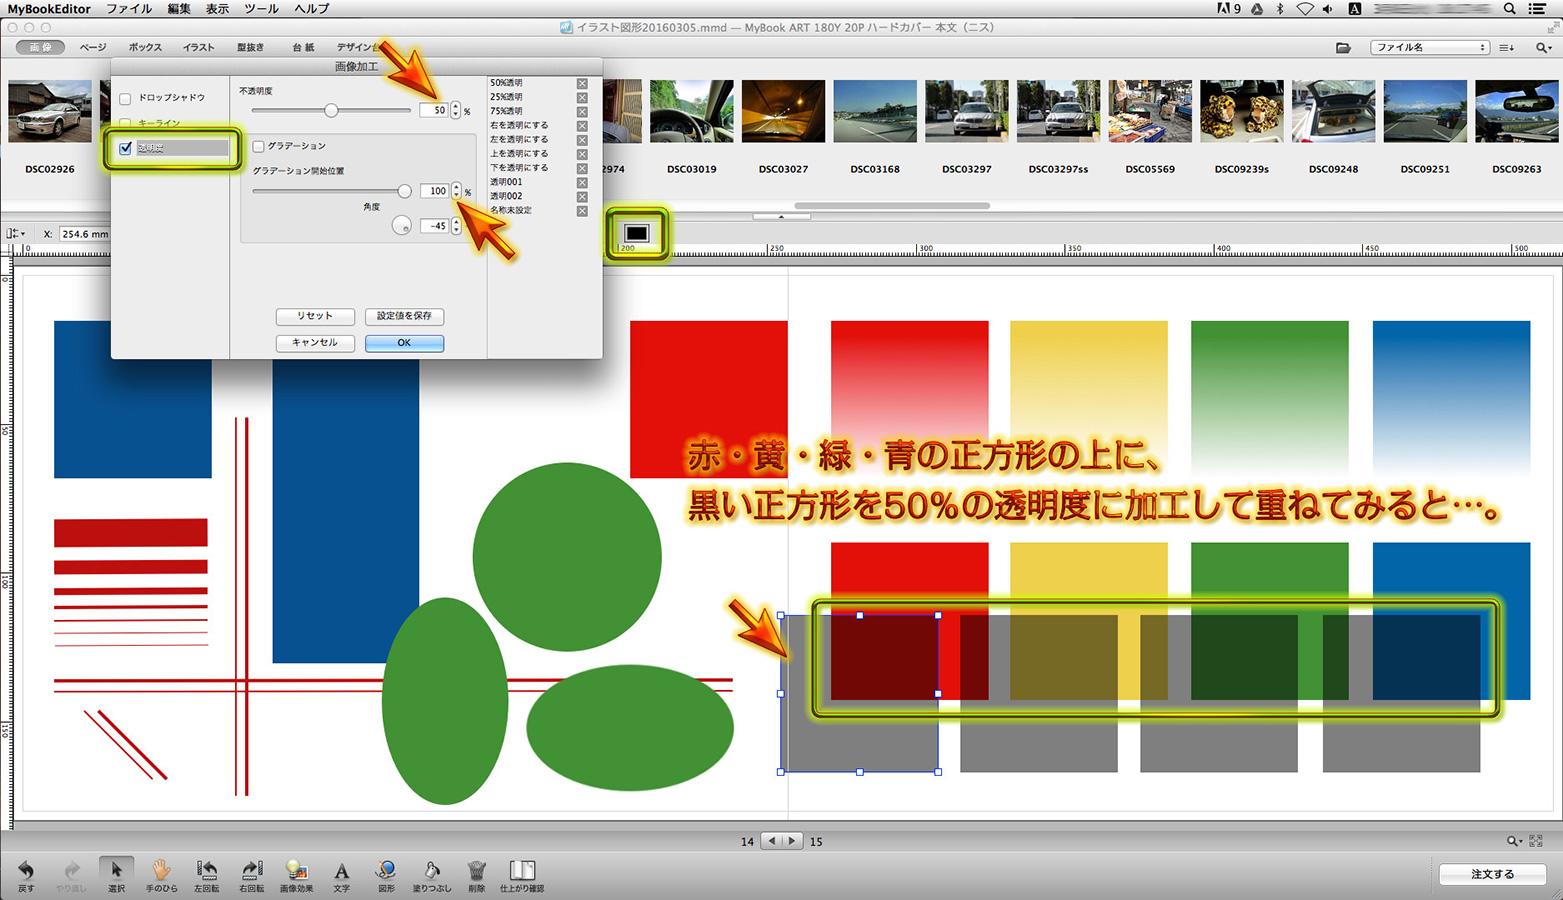 http://moritetsu.info/car/img/mb075-2016-03-08-18-17-45sssss.jpg